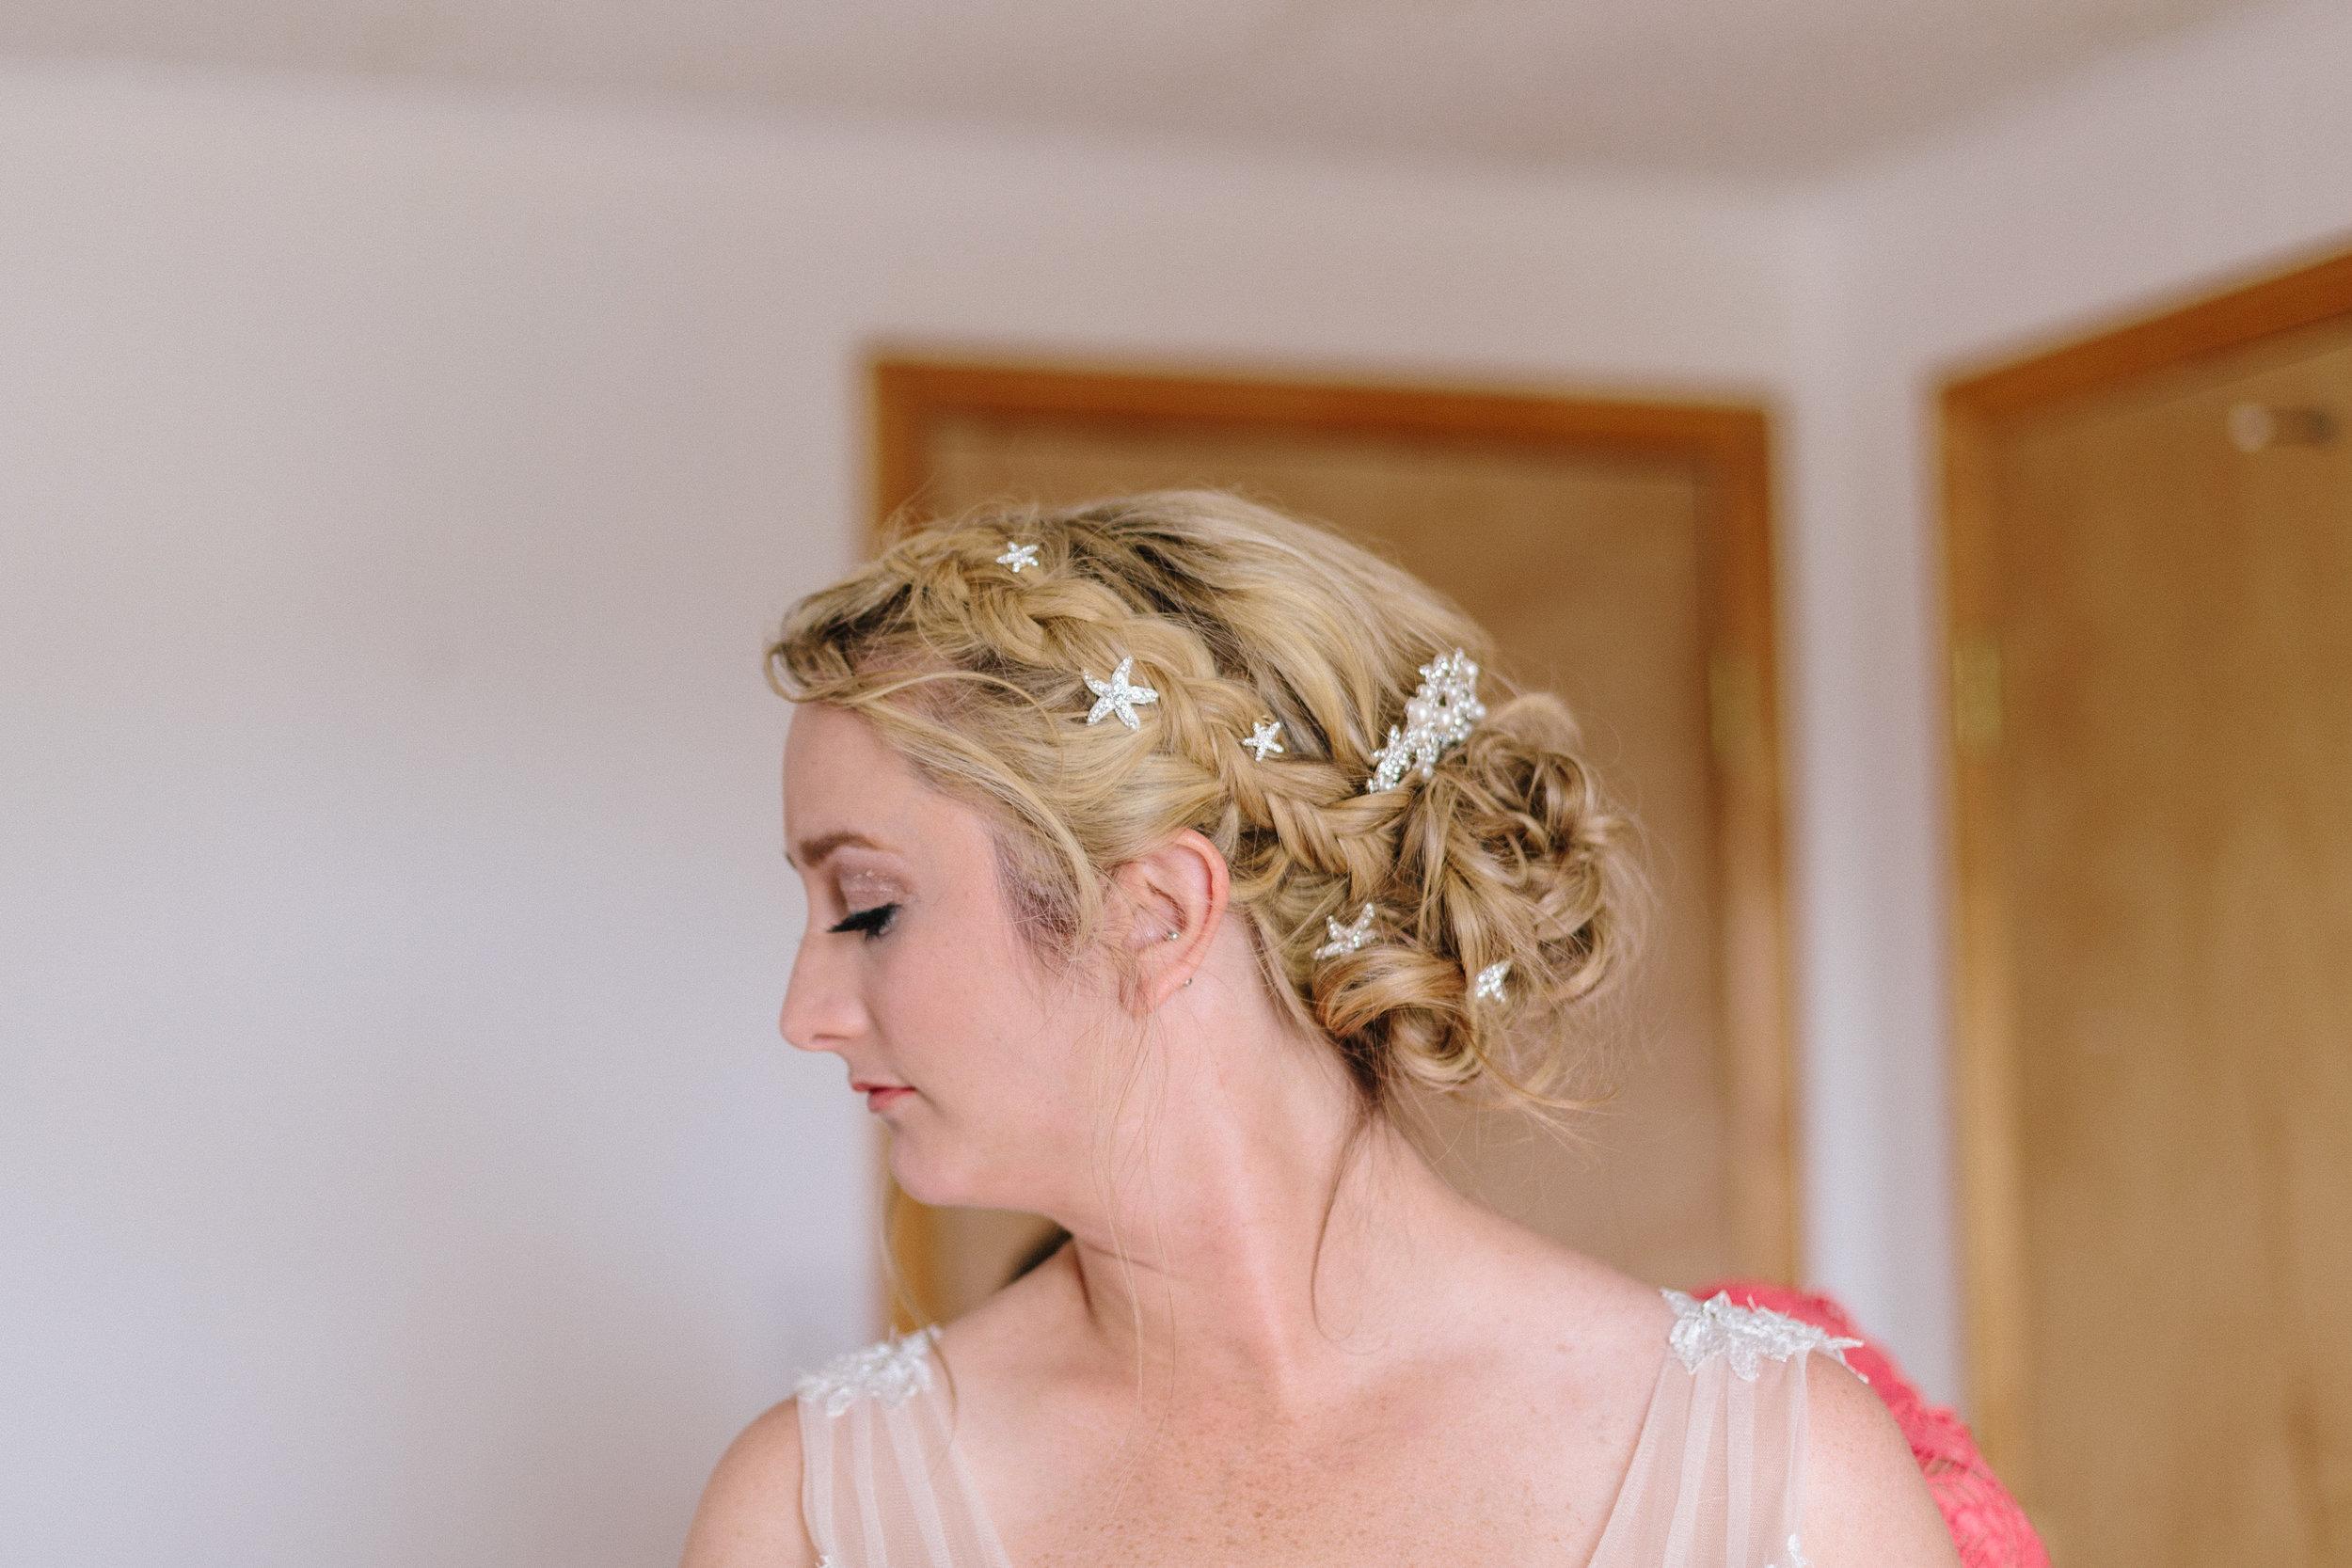 alyssa barletter photography buxton north carolina outer banks obx cape hatteras elopement intmate beach wedding-15.jpg